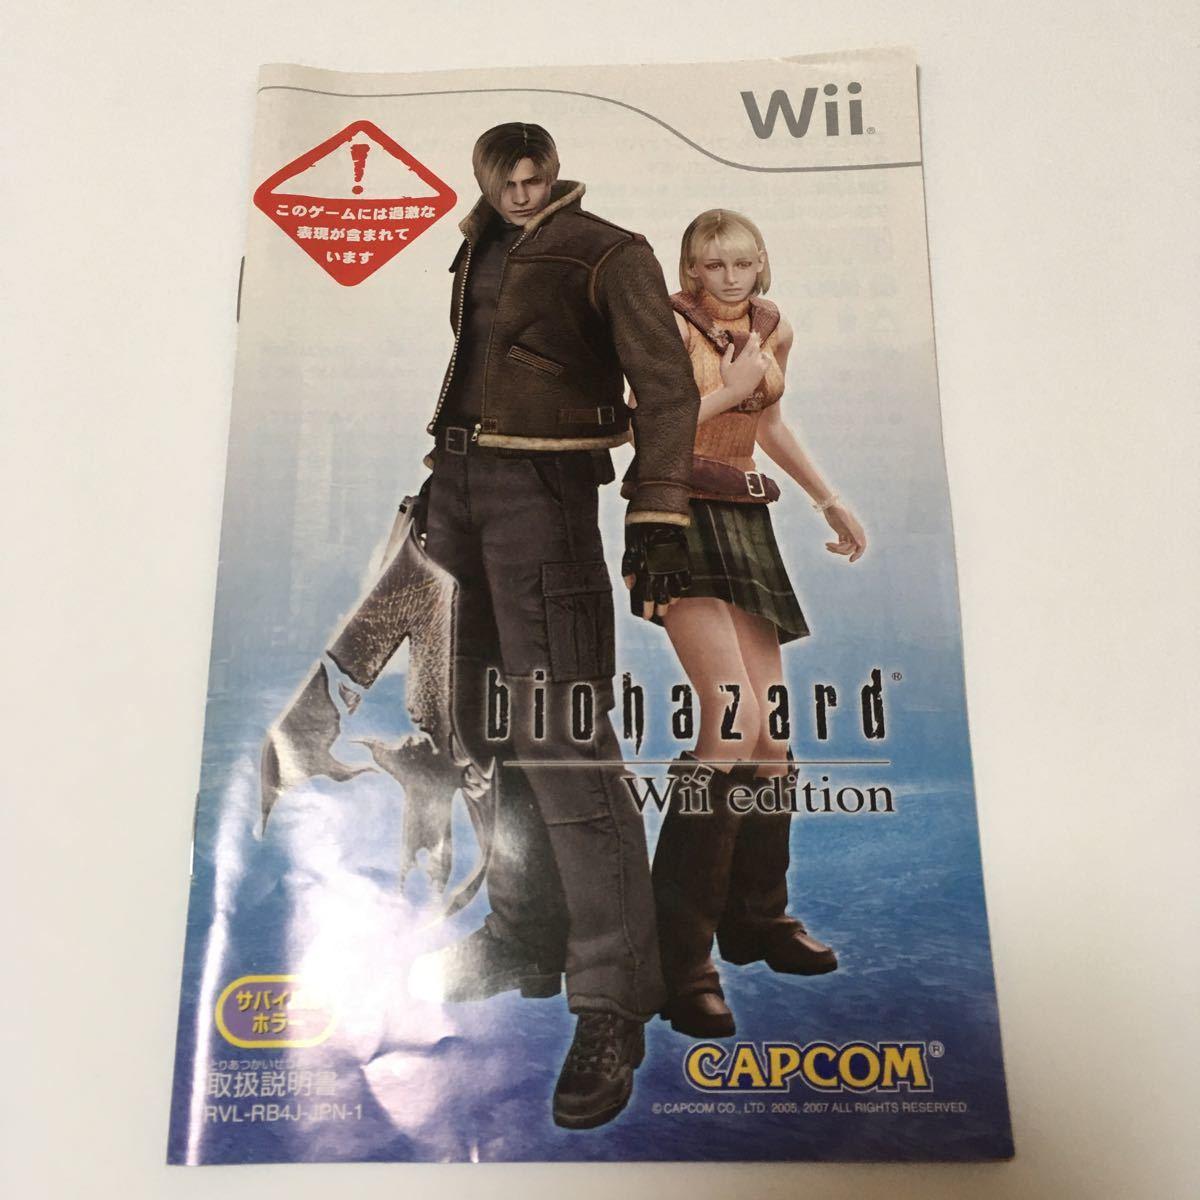 Wii ソフト バイオハザード4 動作未確認 ジャンク バイオ レオン カセット ディスク ゲーム レトロ 任天堂 カプコン